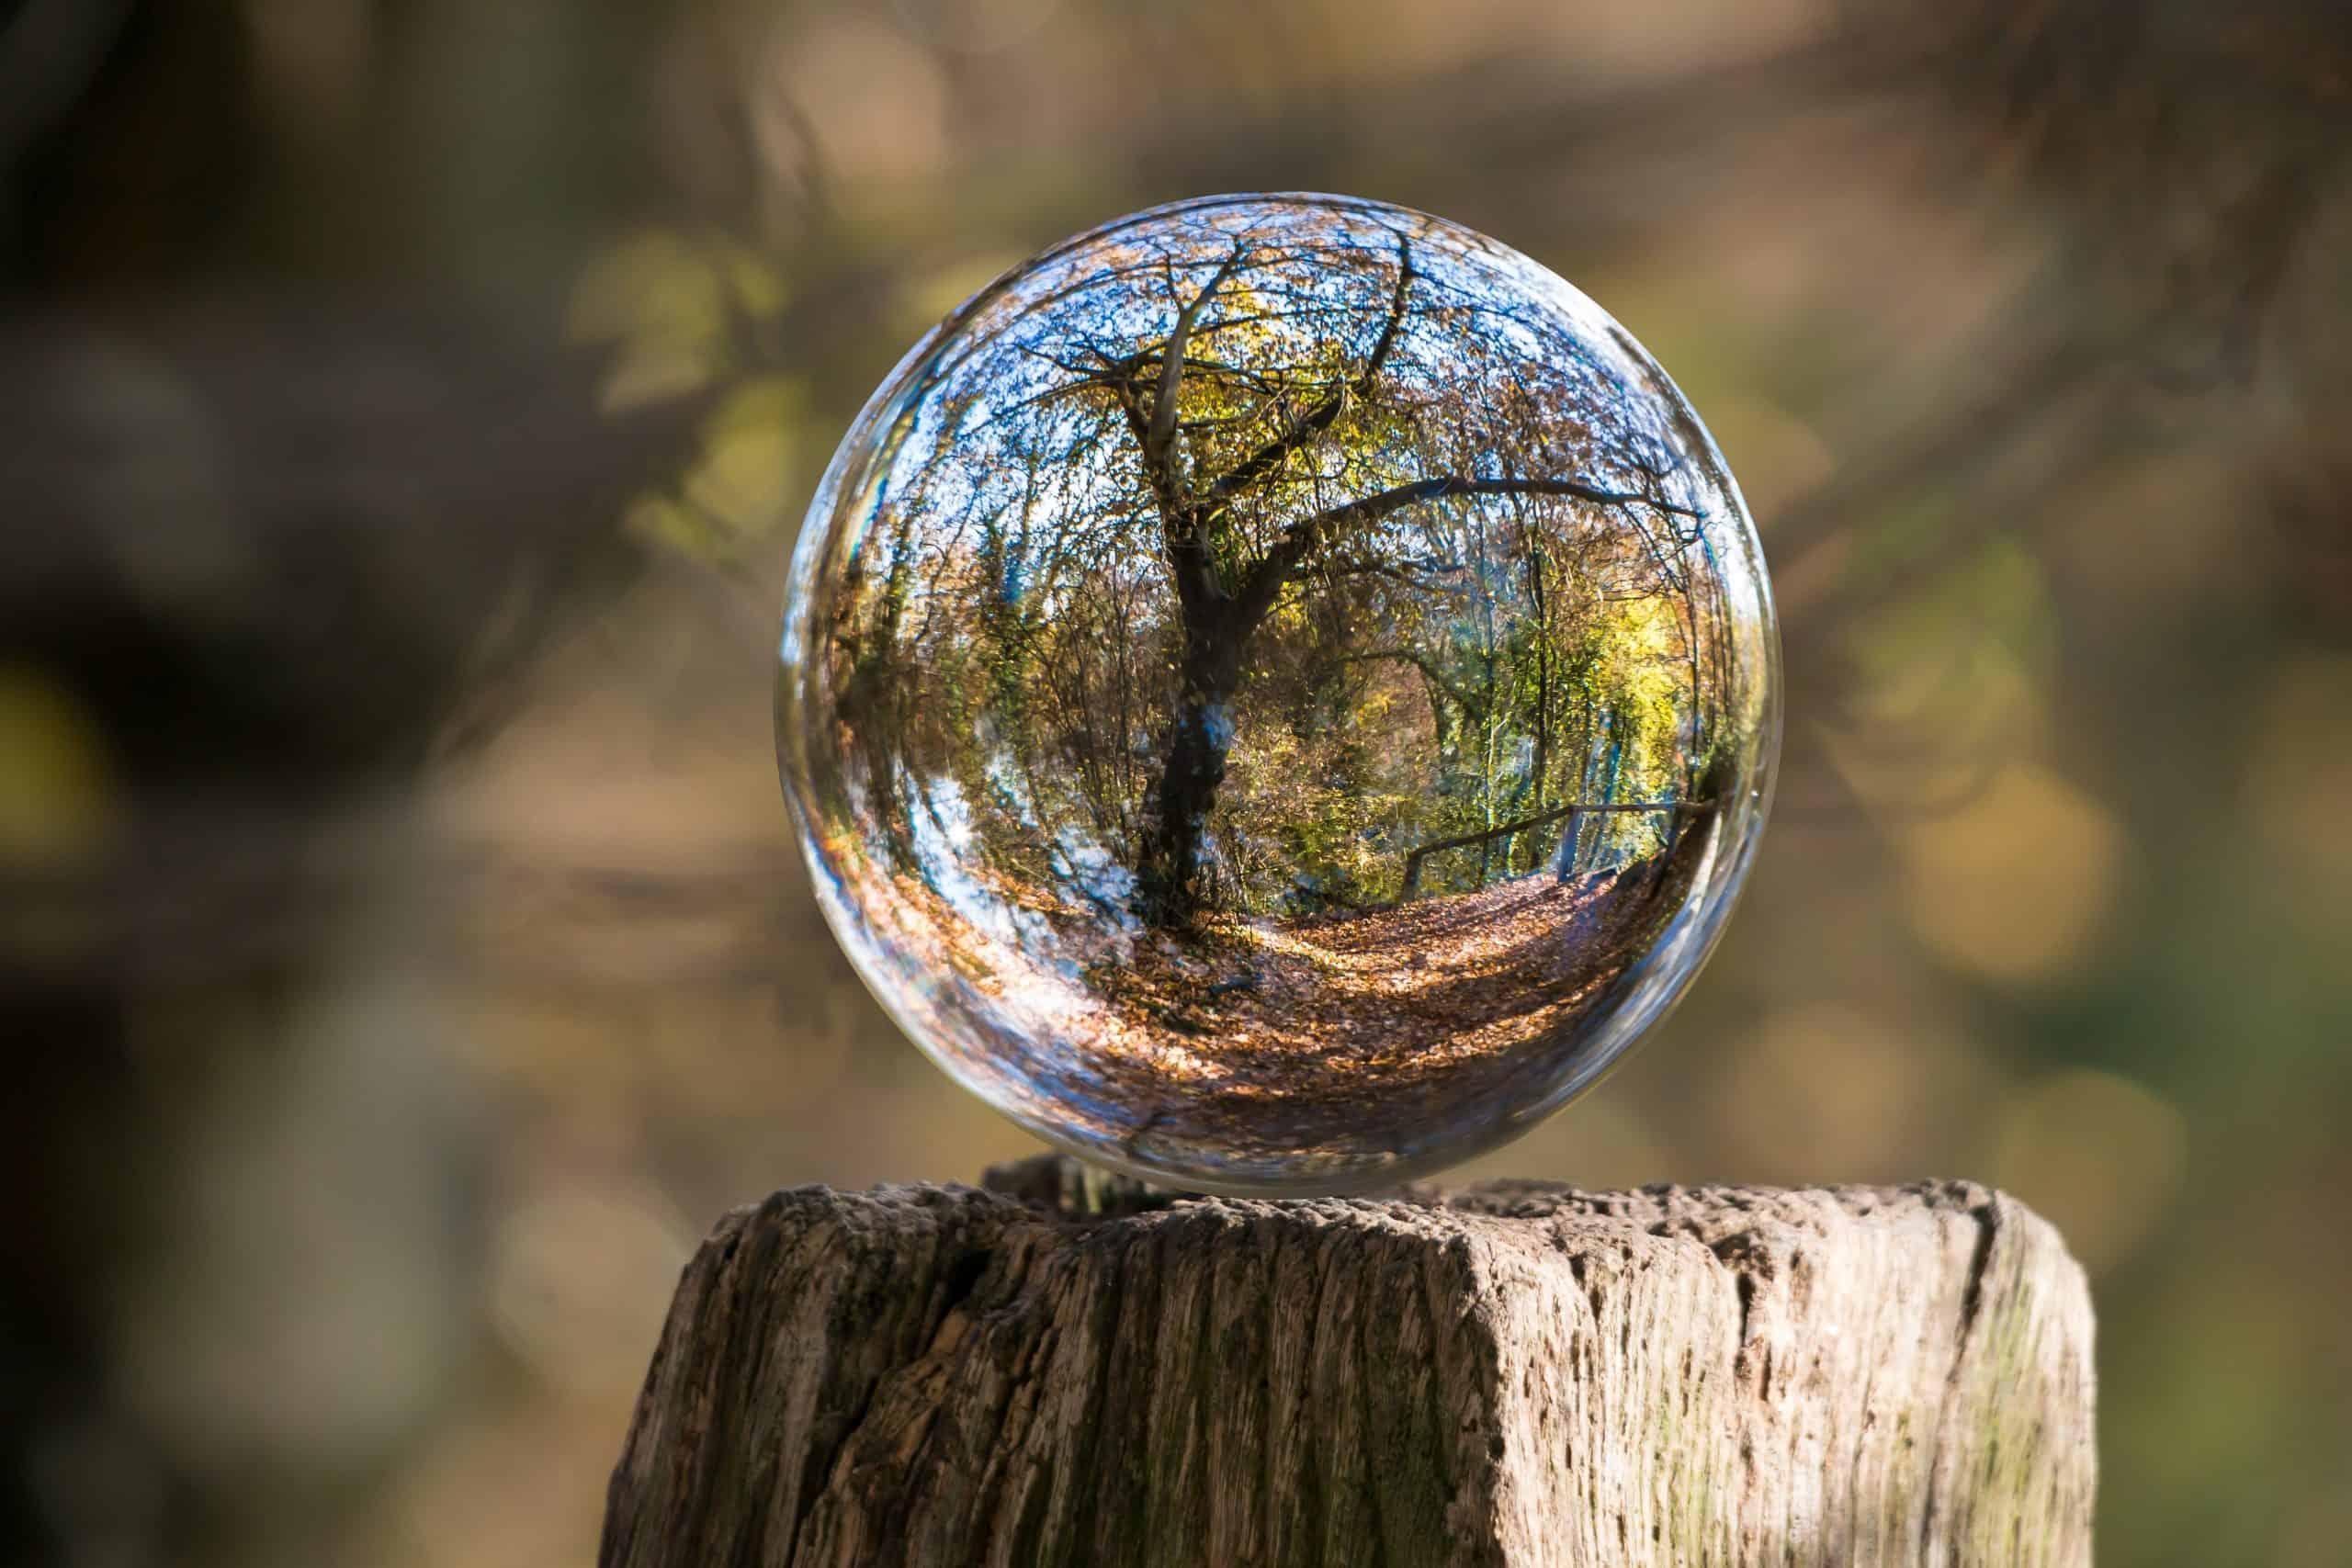 bublina na dreve